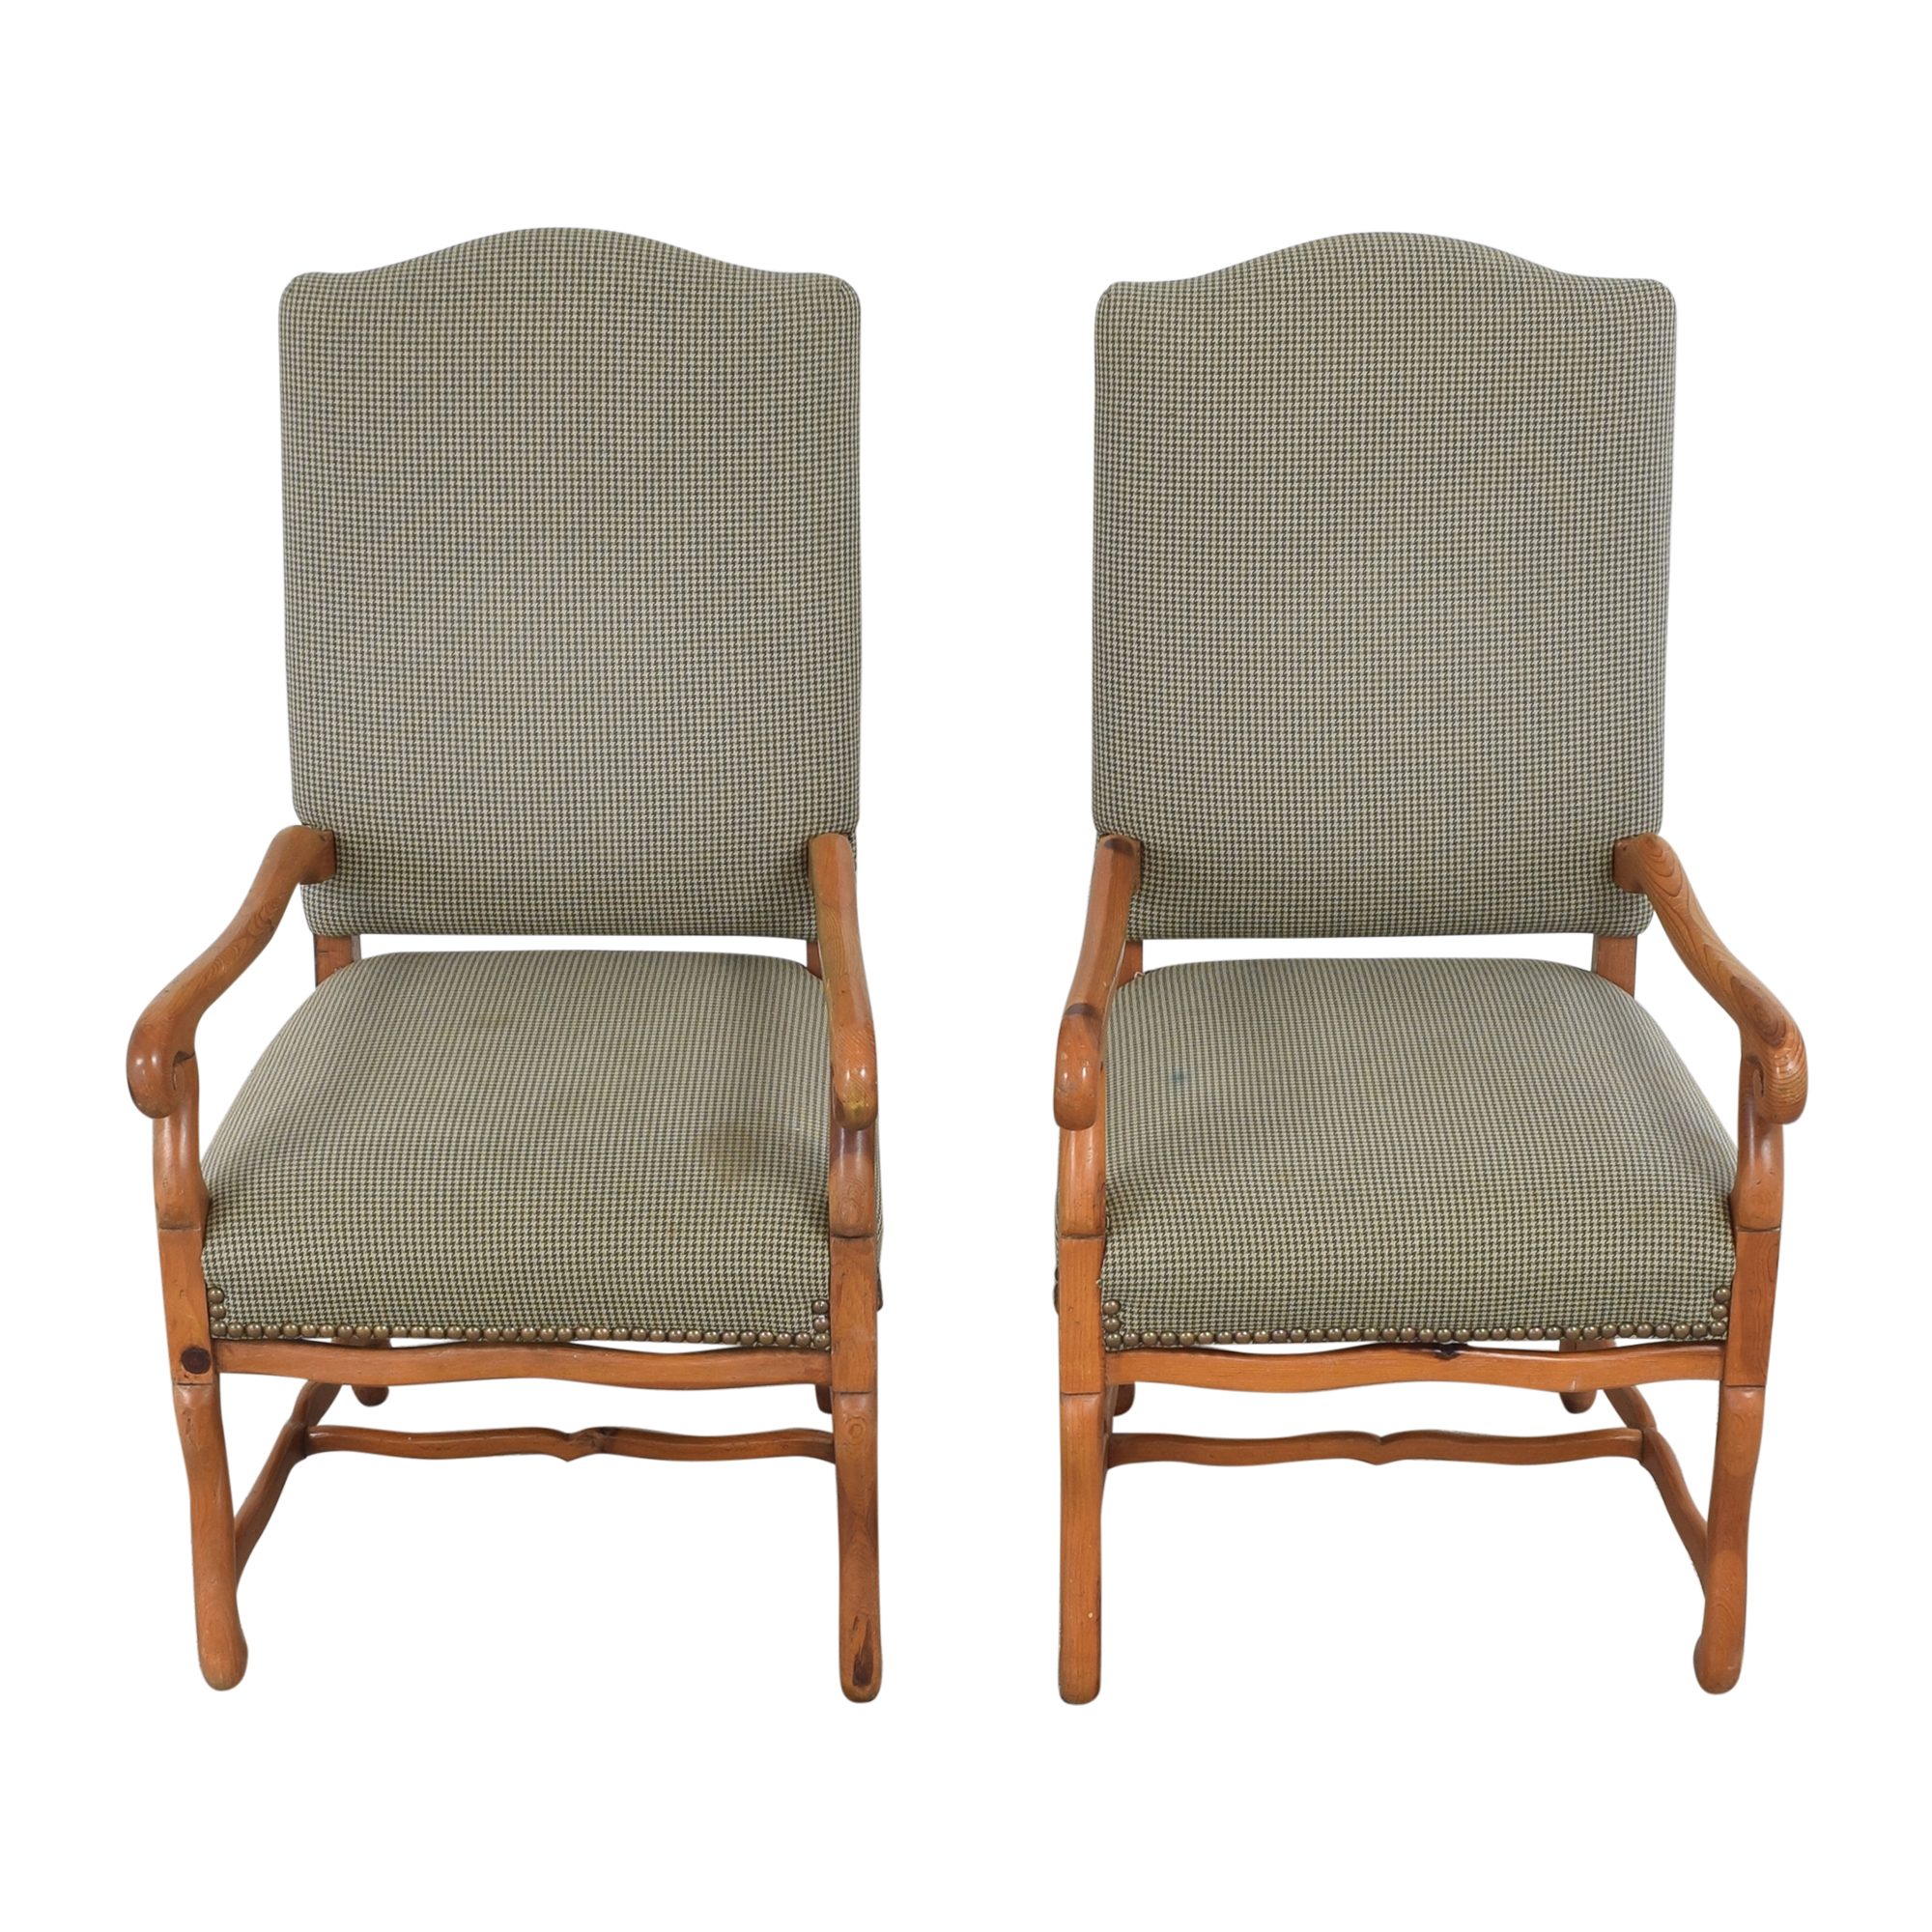 Ralph Lauren Home Ralph Lauren Home Os De Mouton Style Arm Chairs  Chairs